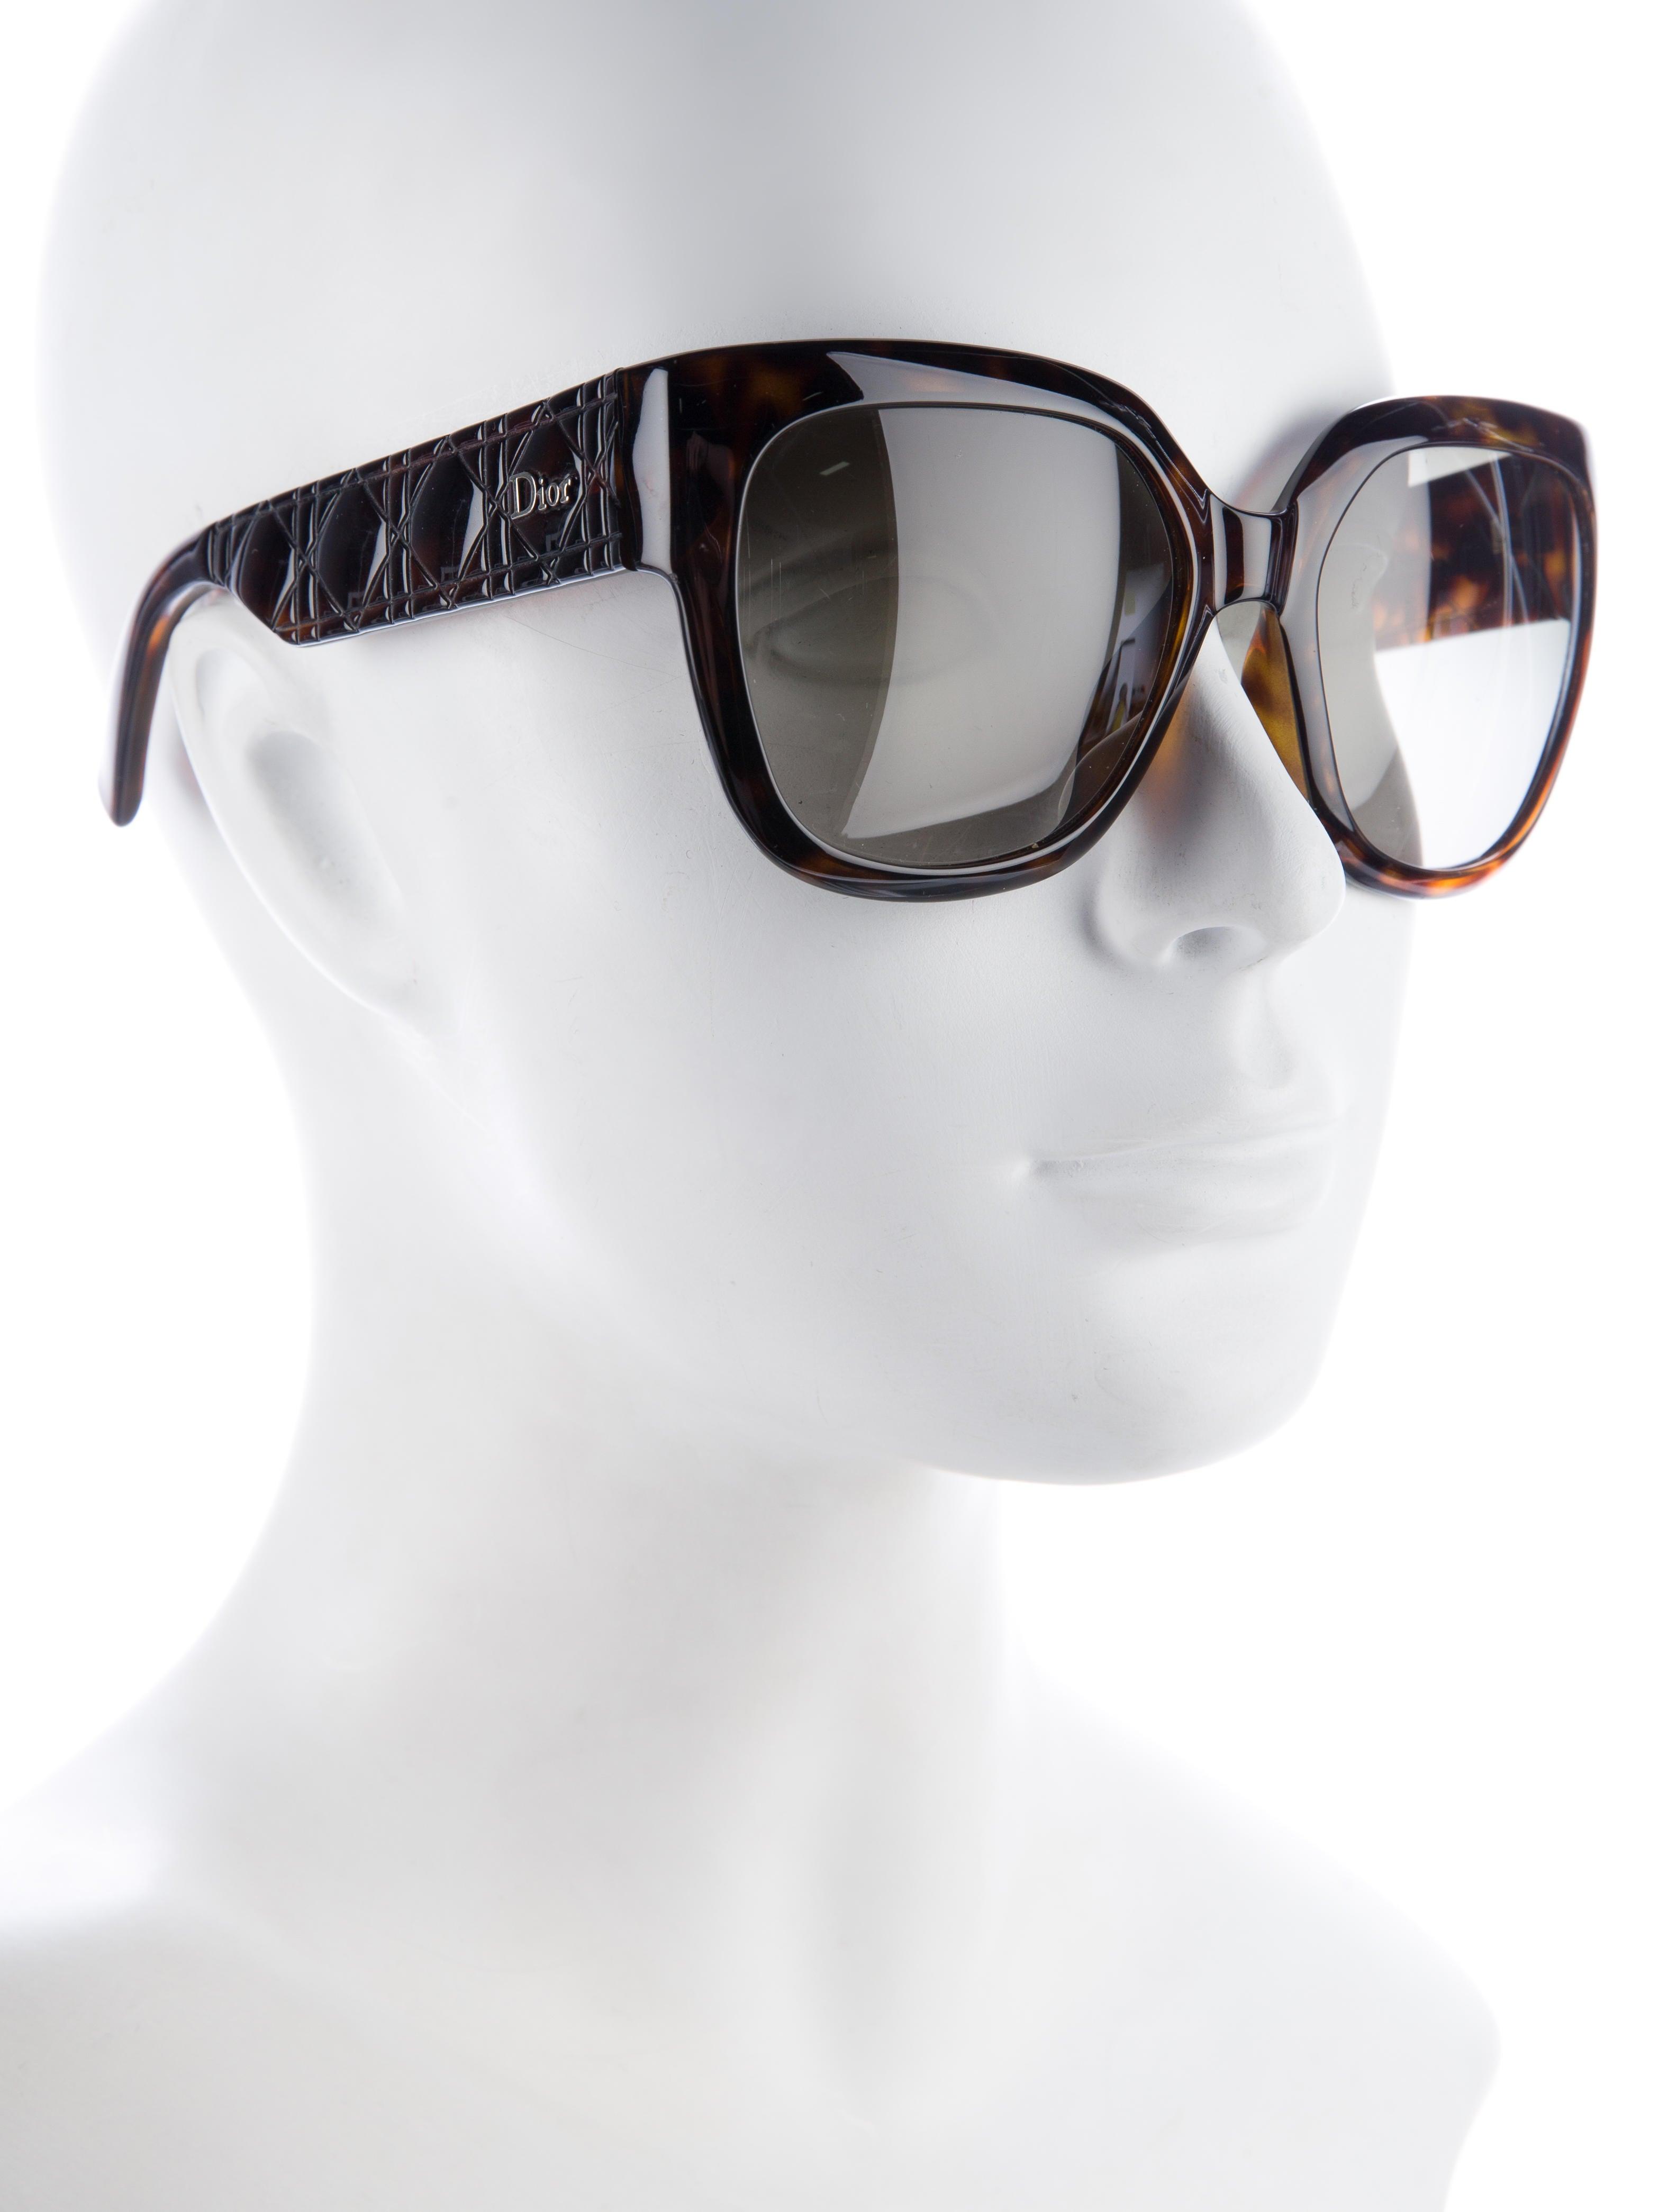 a9272438591e1 Christian Dior Sunglasses Cat Eye